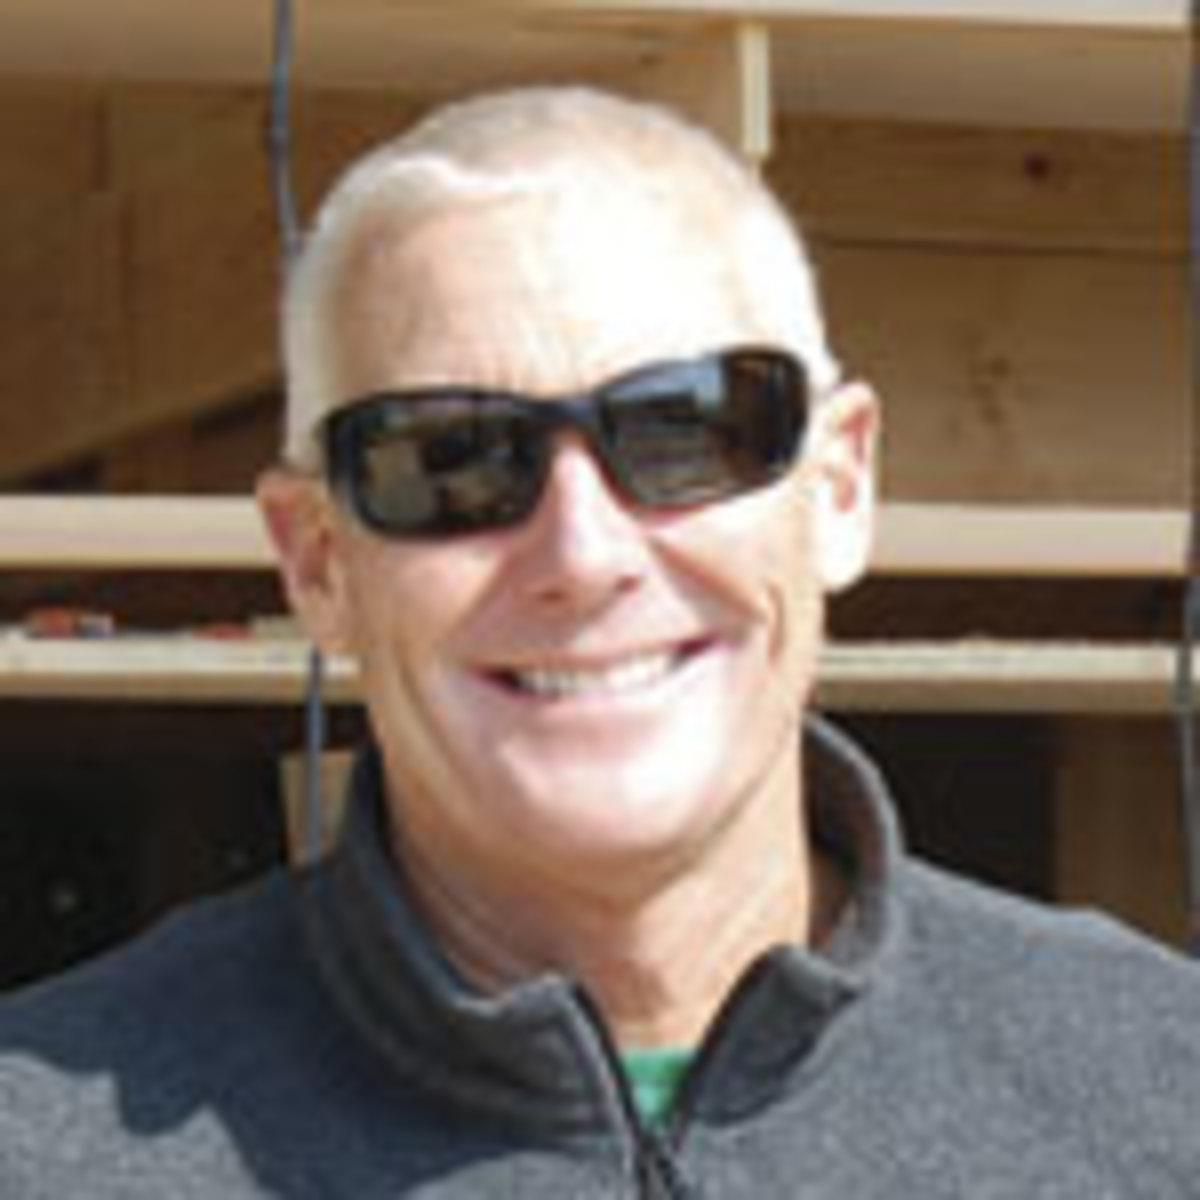 John Bayliss, Boatbuilder, Bayliss Boatworks